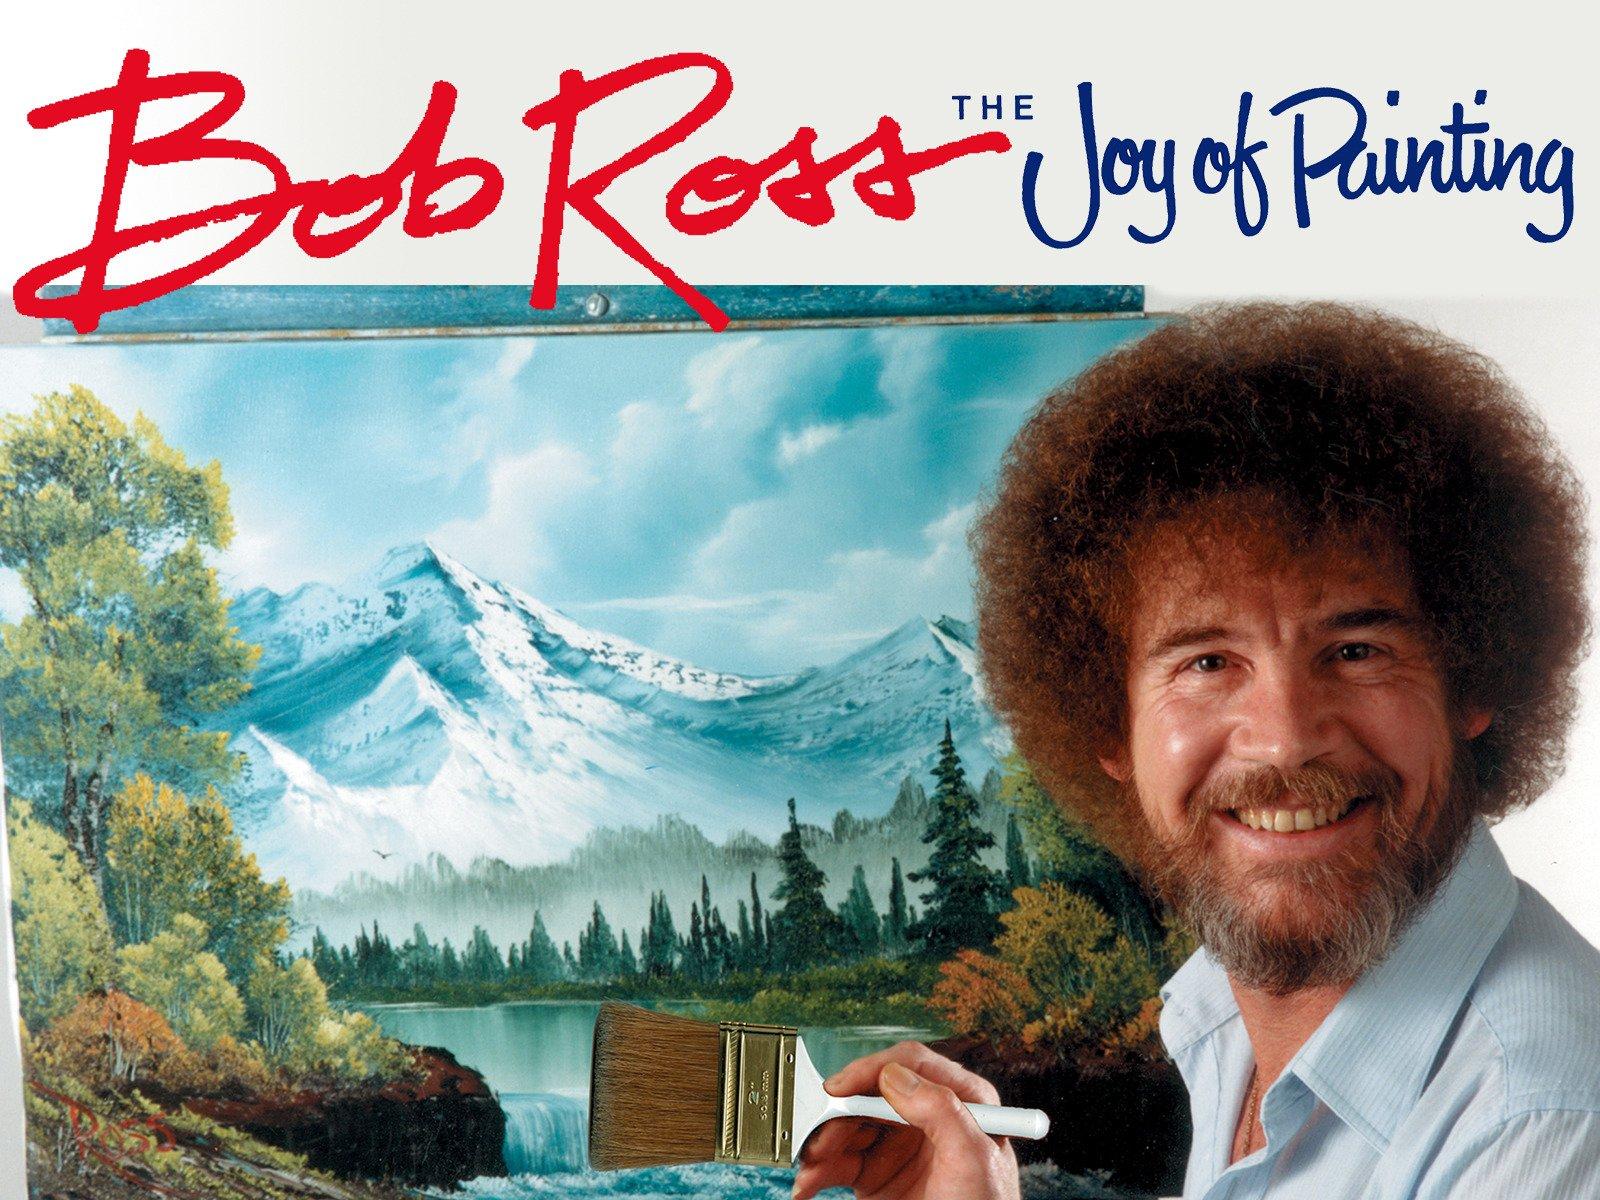 Bob Ross: The Joy of Painting - Season 12